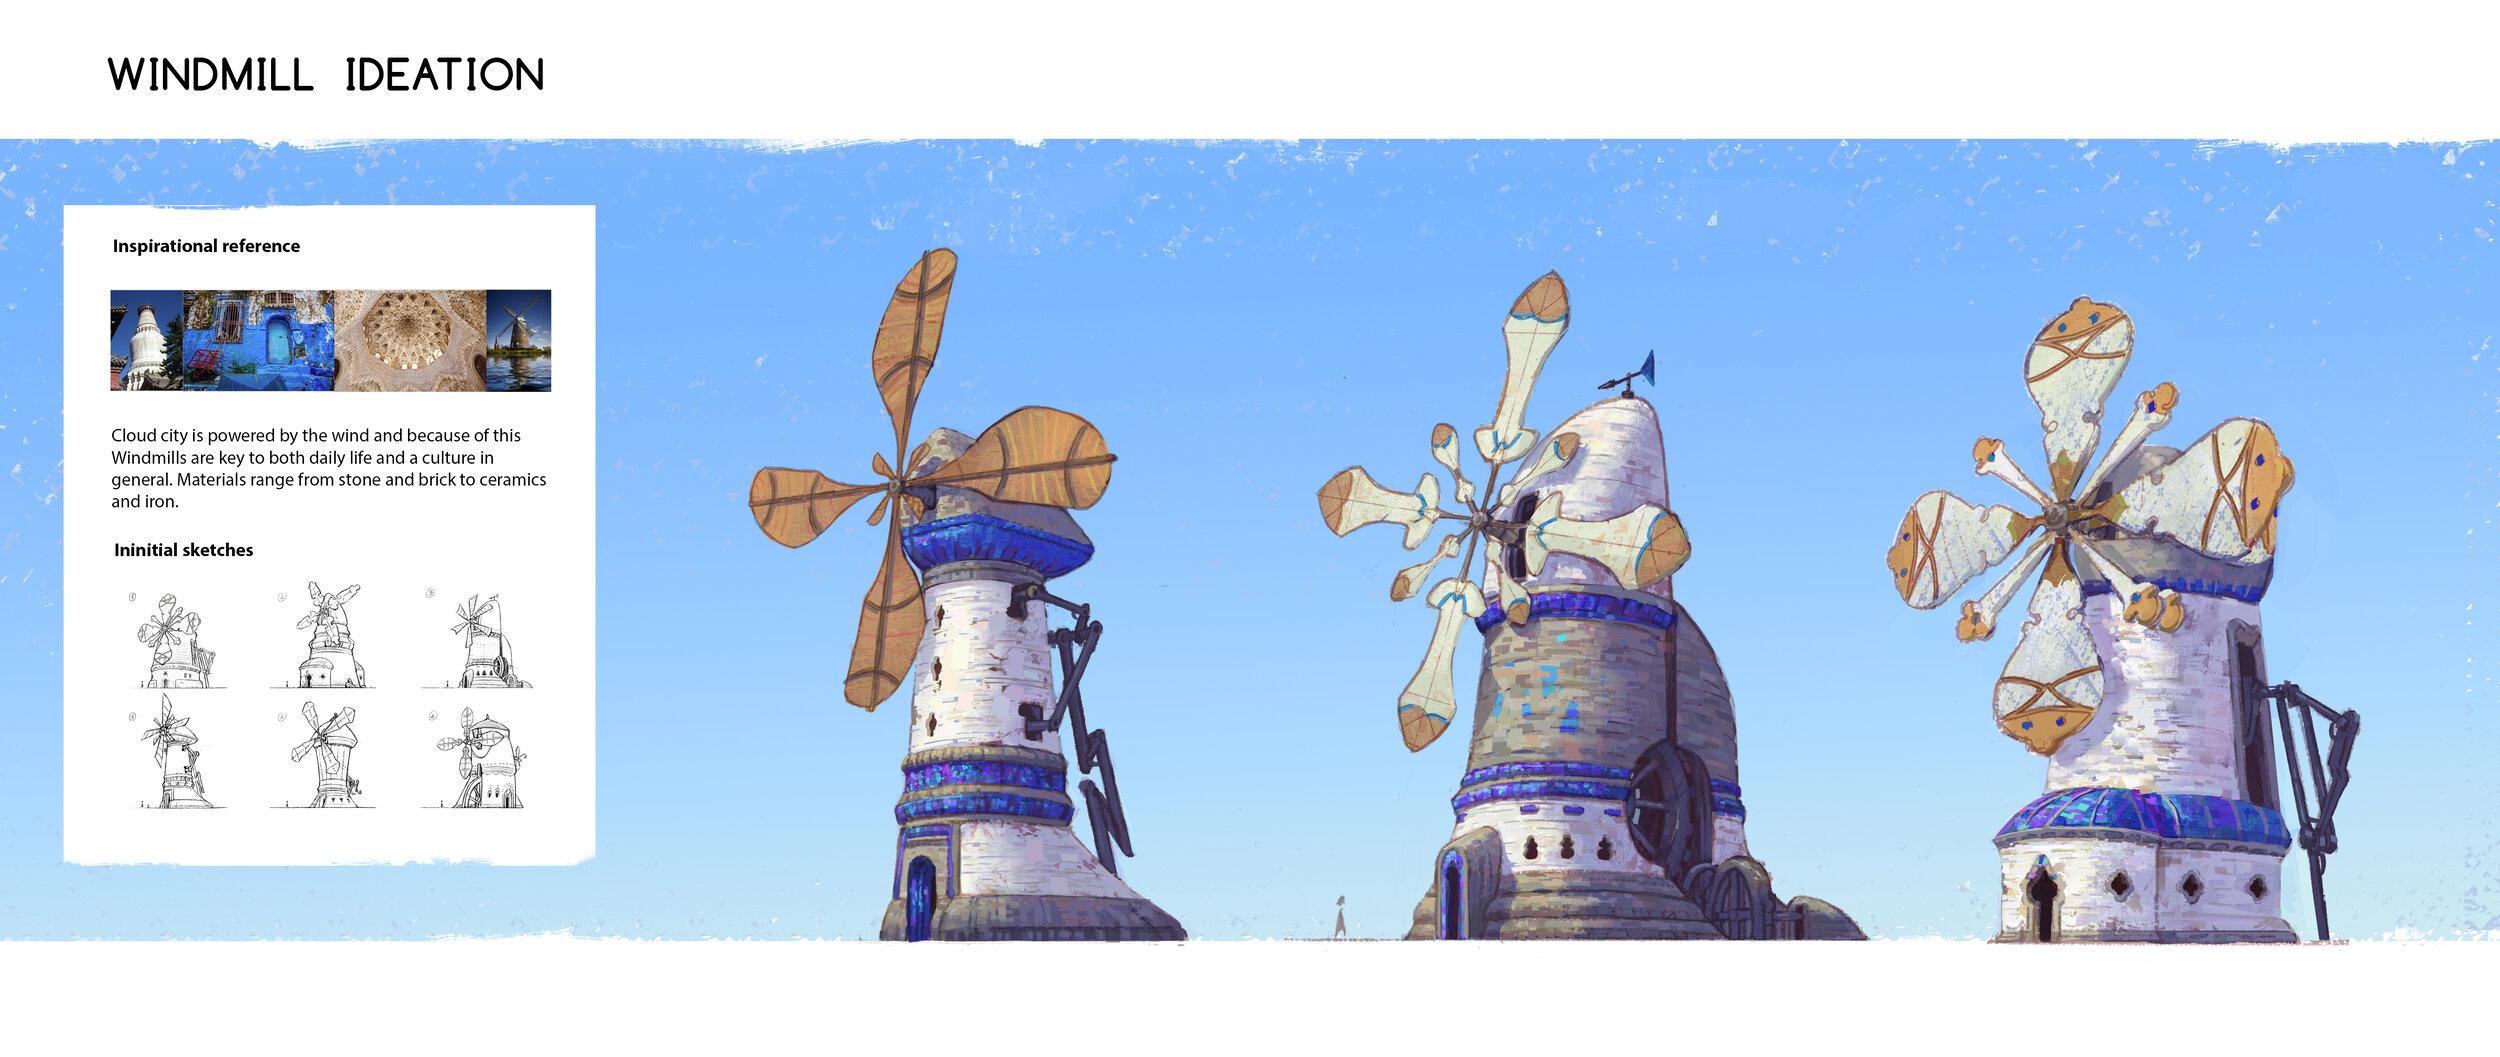 windmill ideation